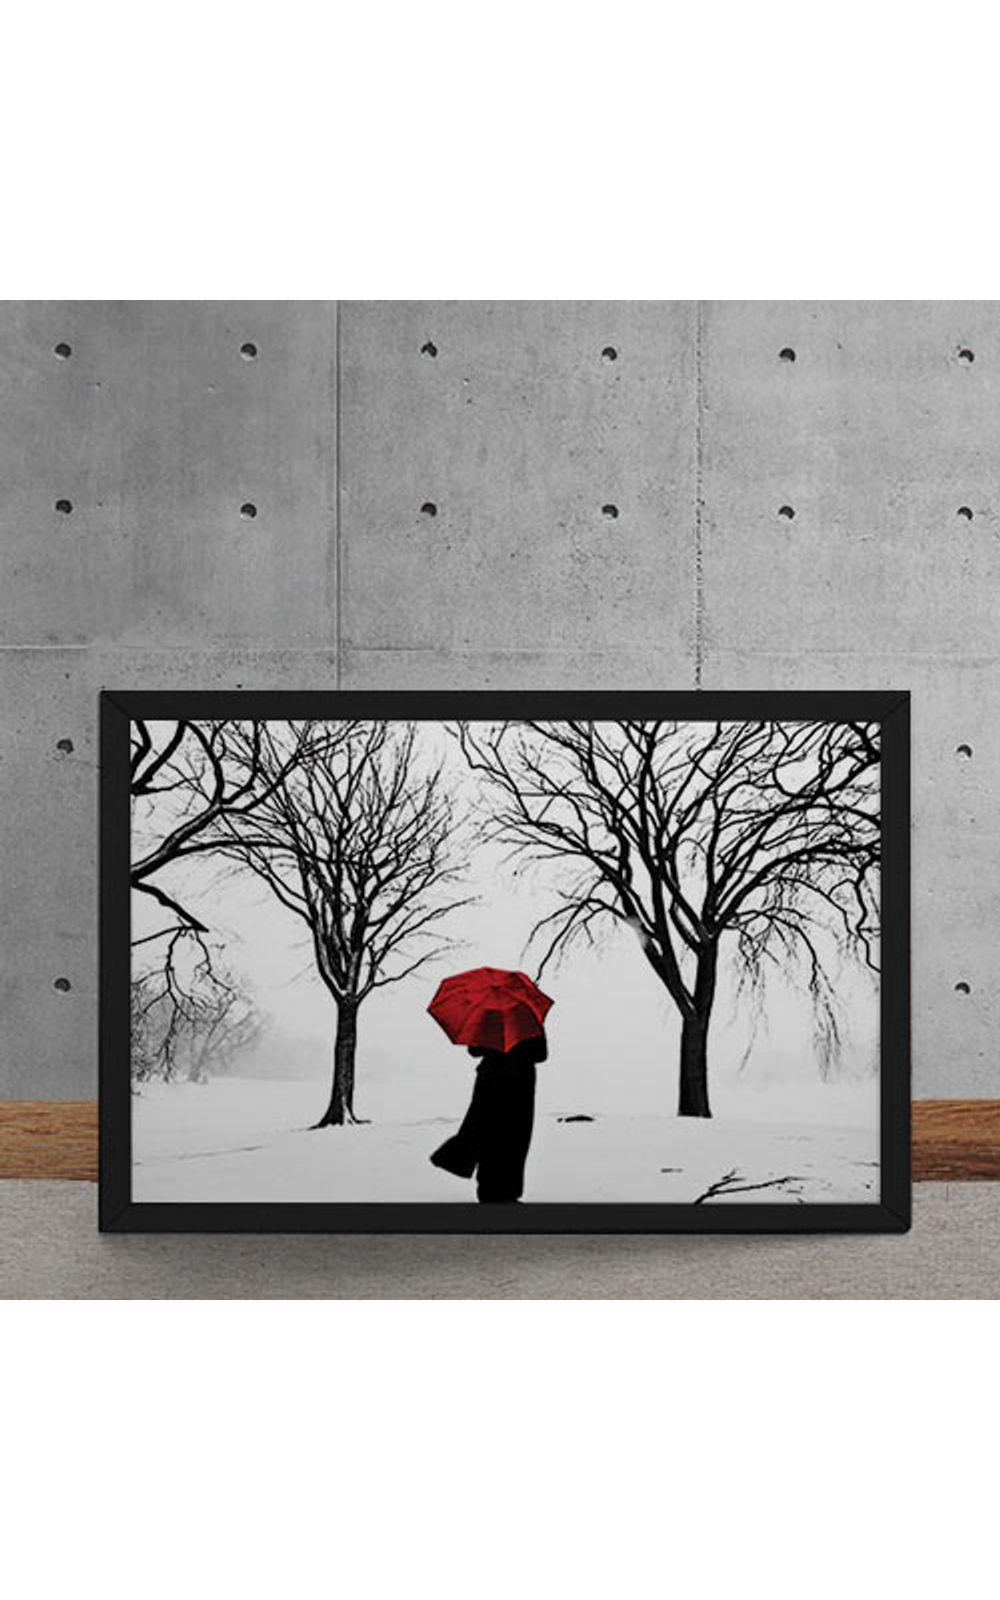 Foto 5 - Quadro Decorativo Guarda Chuva Vermelho na Neve